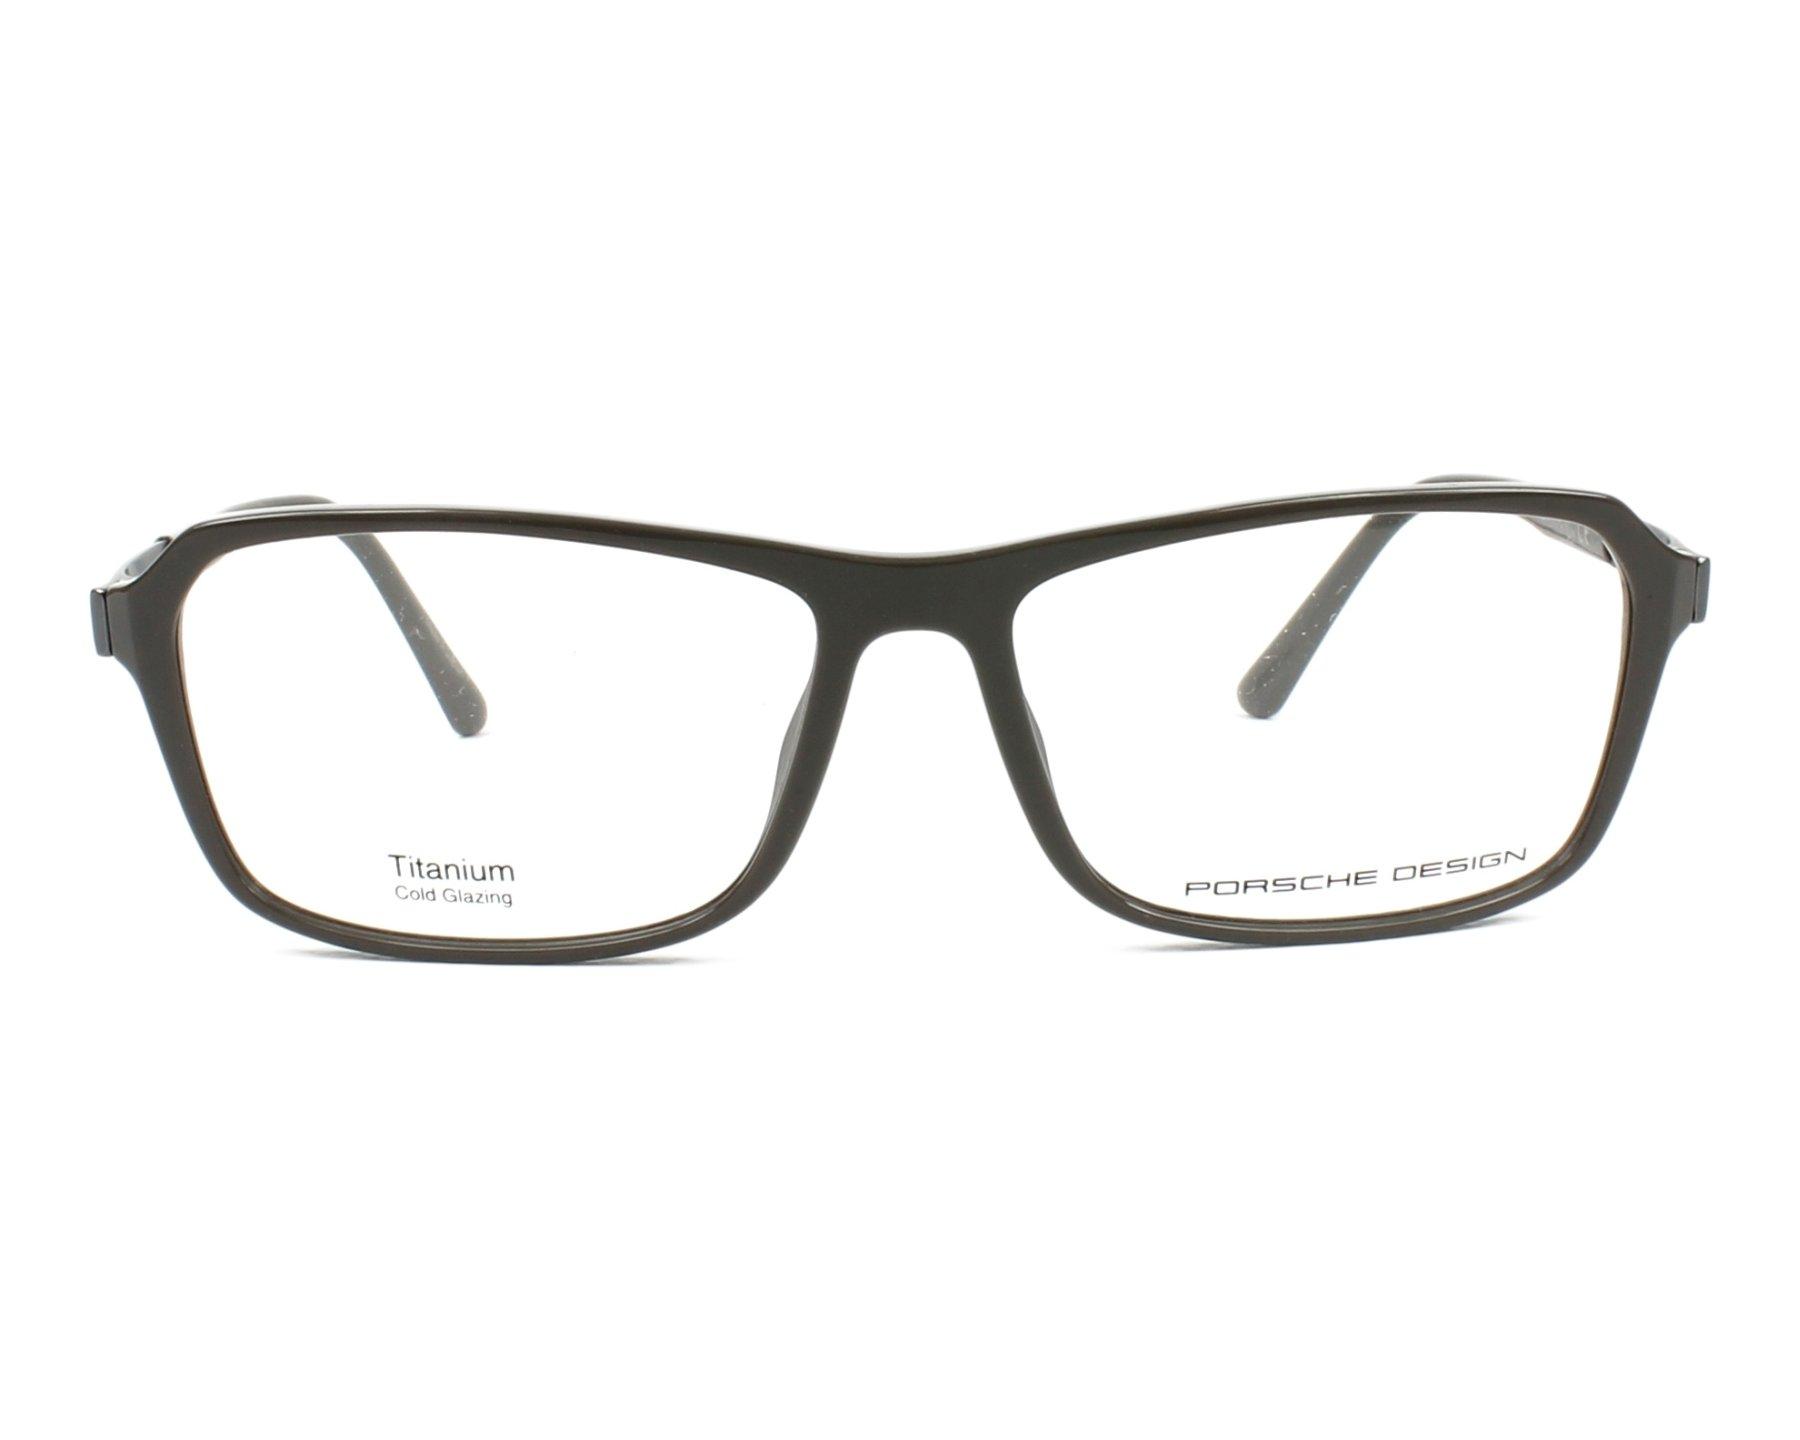 f5804d118f6f eyeglasses Porsche Design P-8267 A 55-14 Grey Gun front view